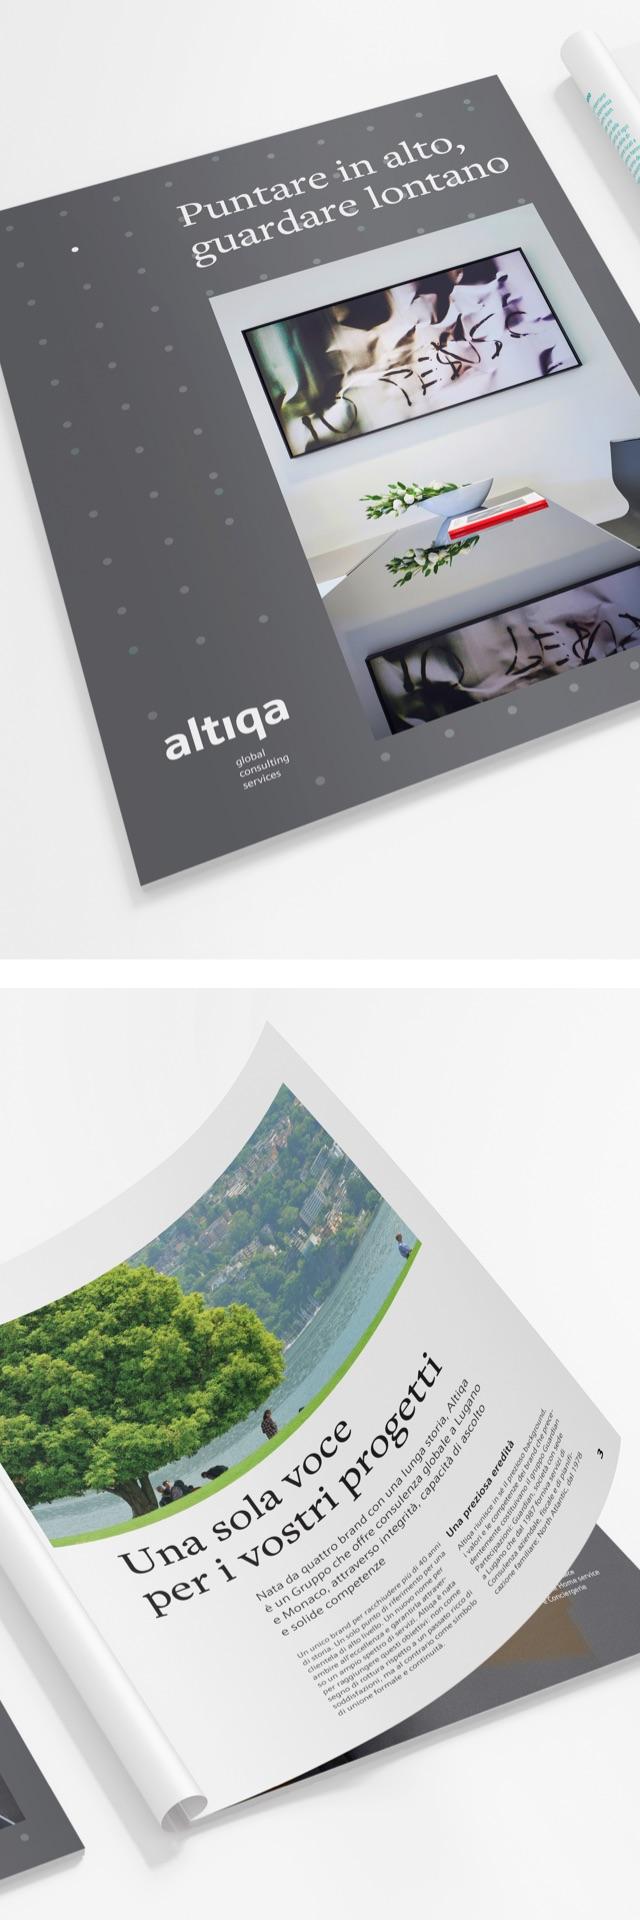 ALT_11_mobile